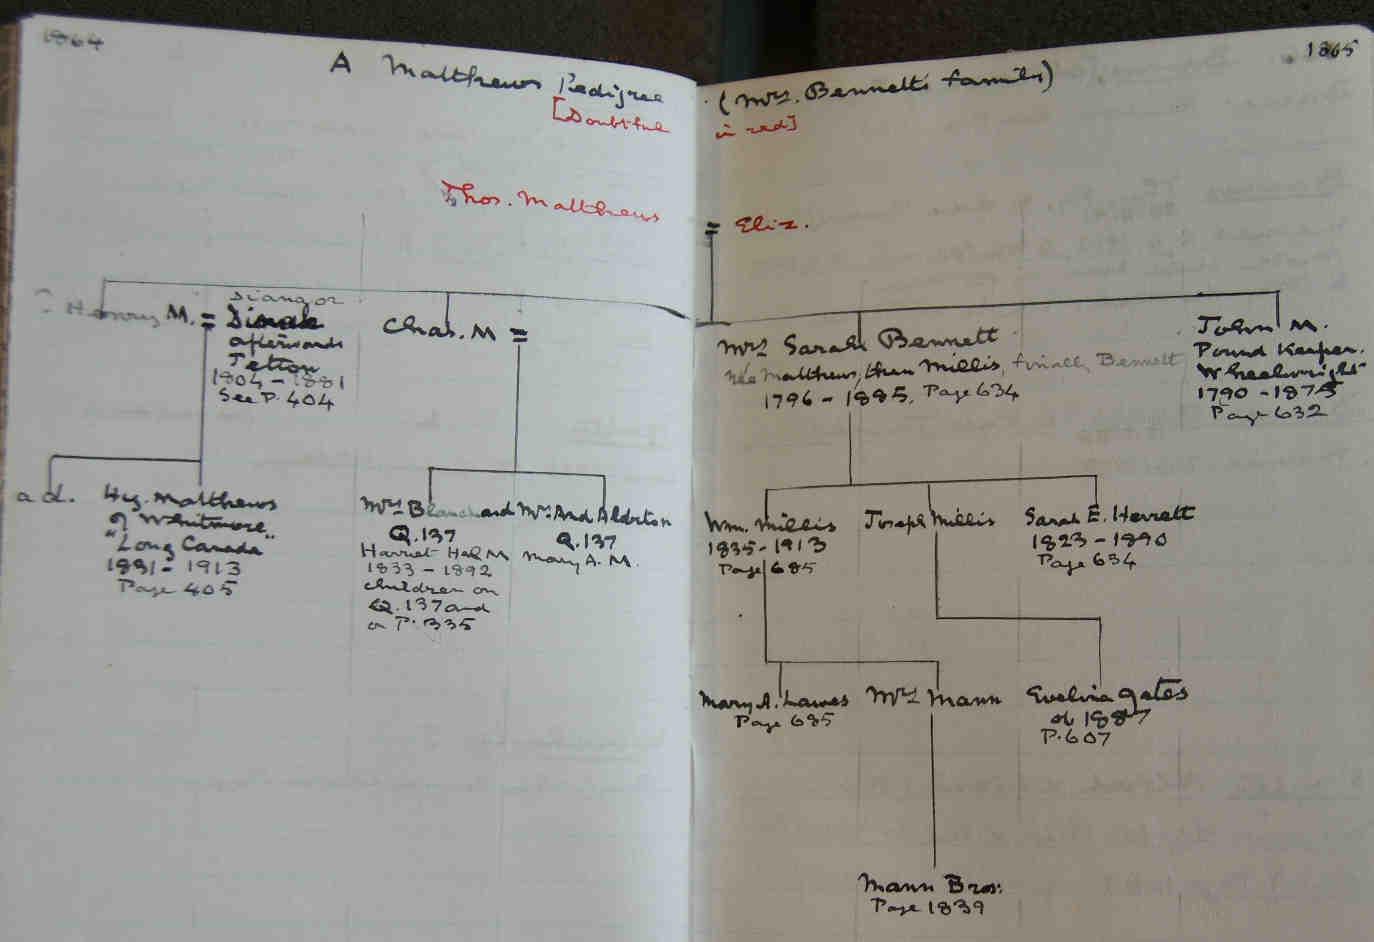 Rev Laverty Notebooks | Headley, Hampshire, UK